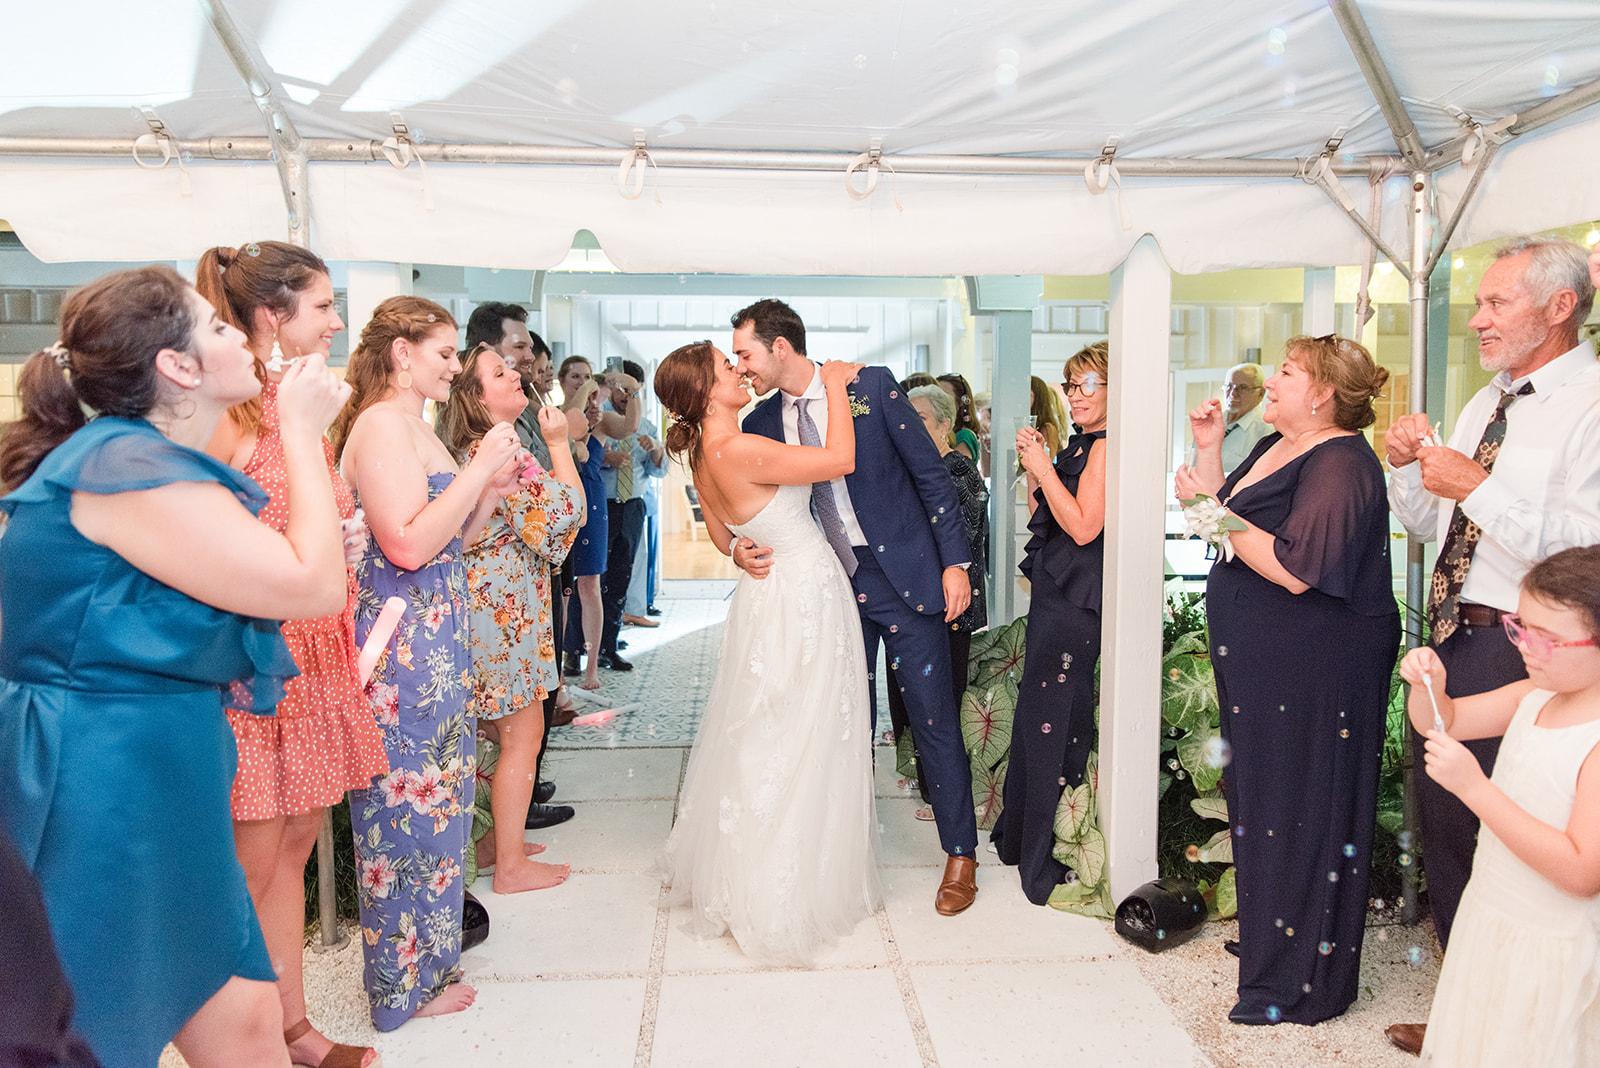 newlyweds kiss during bubble exit at Fairhope AL destination wedding reception